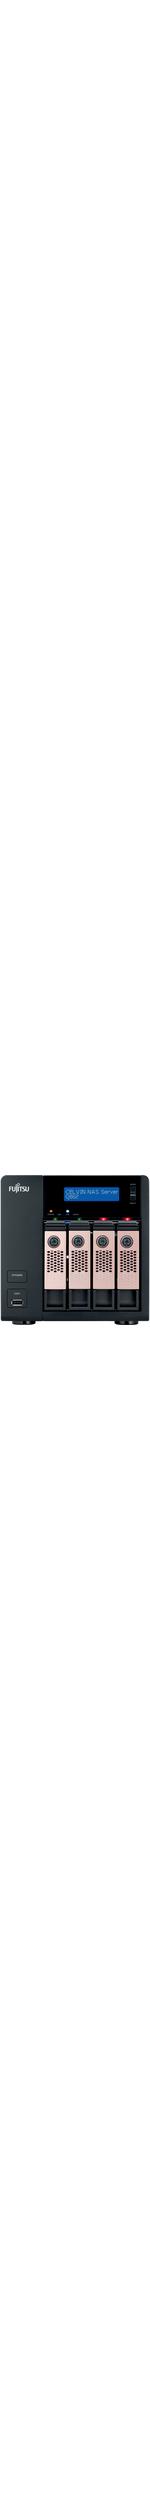 Fujitsu CELVIN Q802 4 x Total Bays NAS Server - Tower - Intel Atom2.10 GHz - 12 TB HDD 4 x 3 TB Serial ATA/600 SSD - 1 GB RAM DDR3 SDRAM - RAID Supported 0, 1, 5,